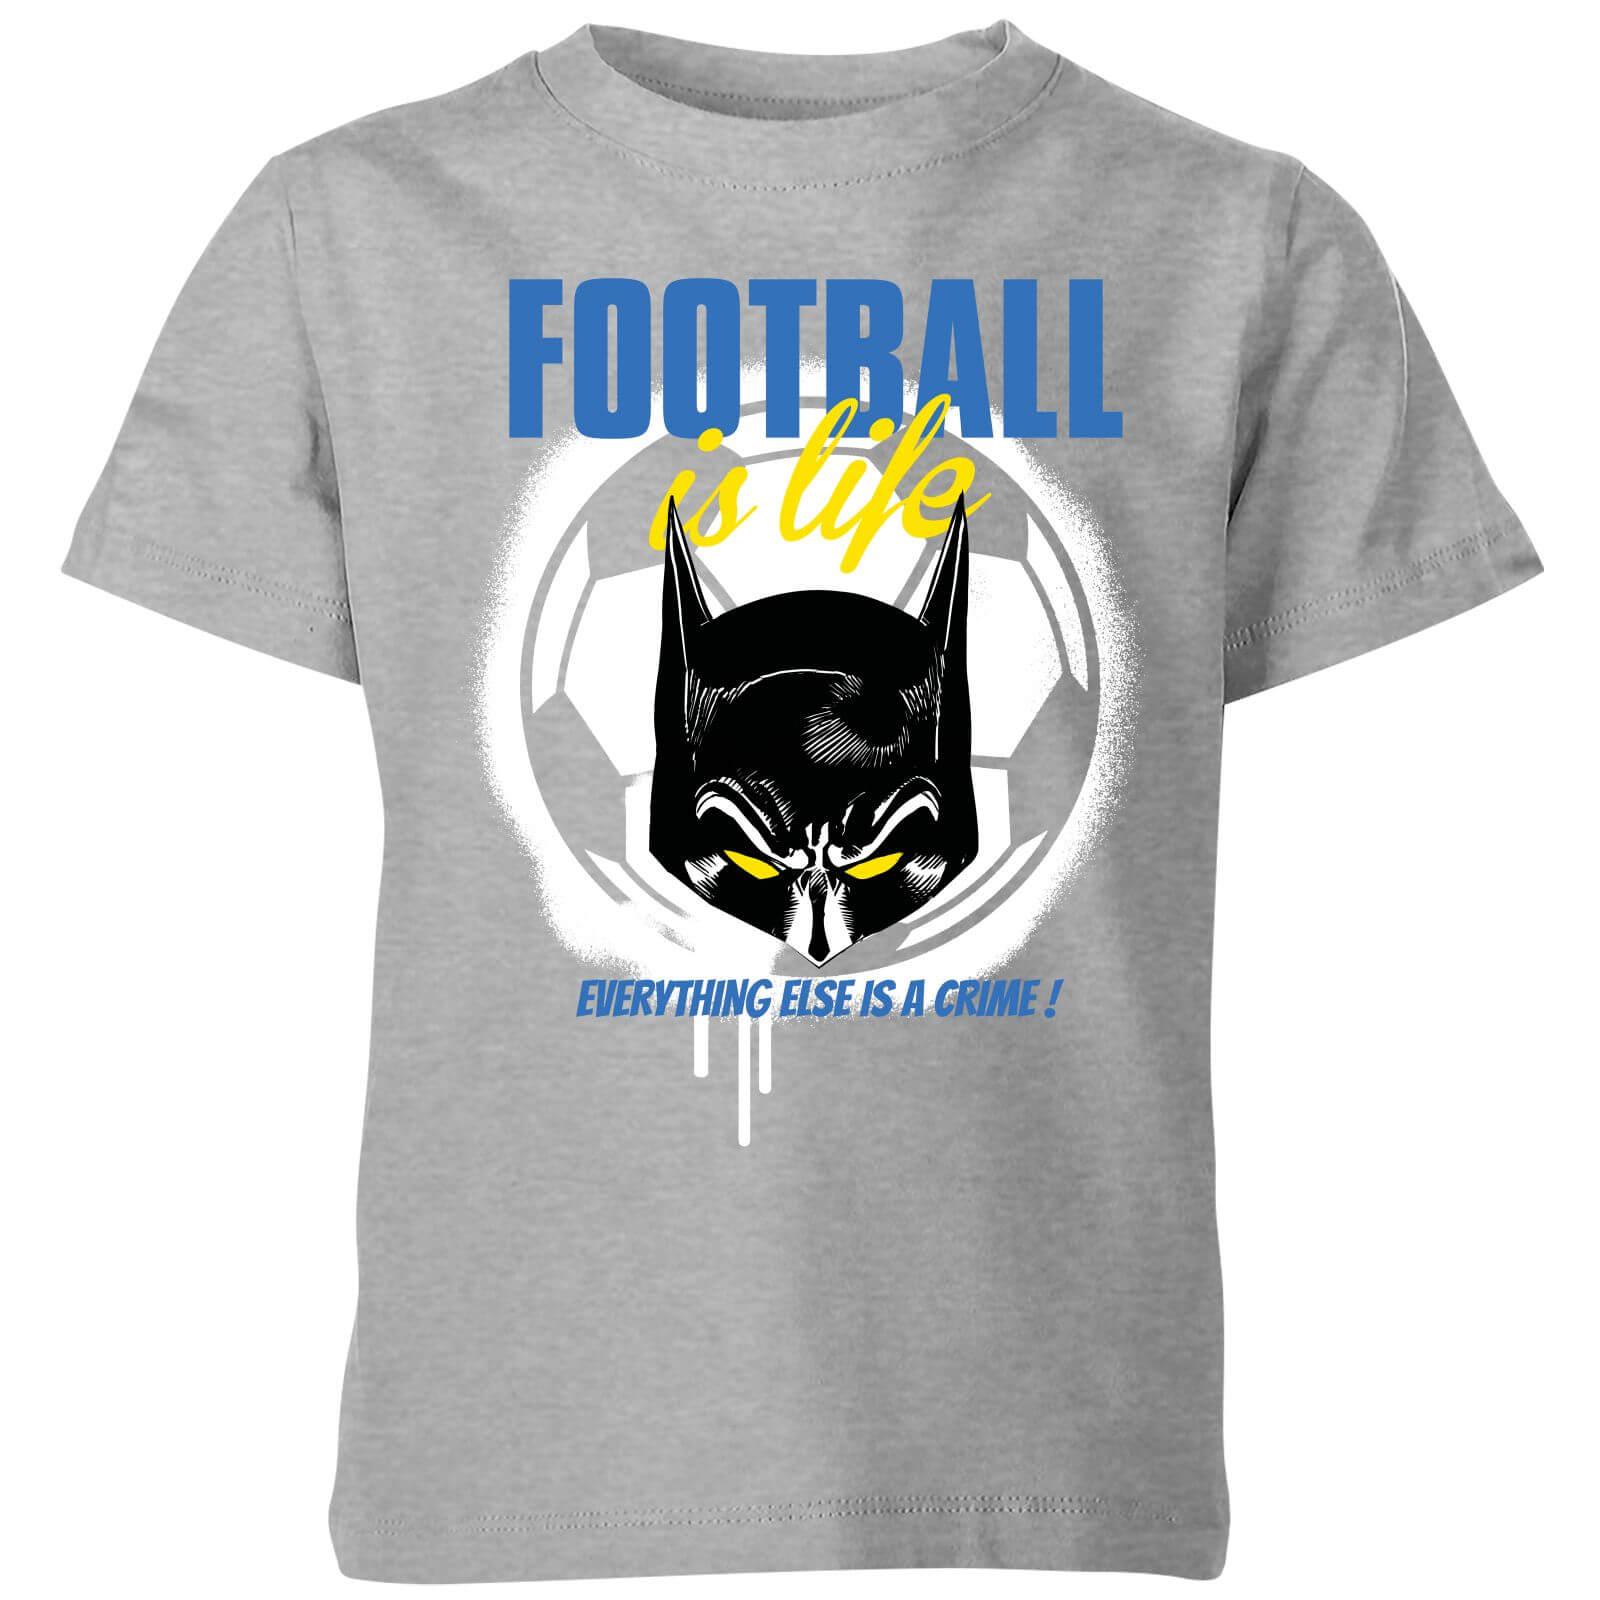 OfferteWeb.click 65-dc-batman-football-is-life-kids-t-shirt-grey-7-8-anni